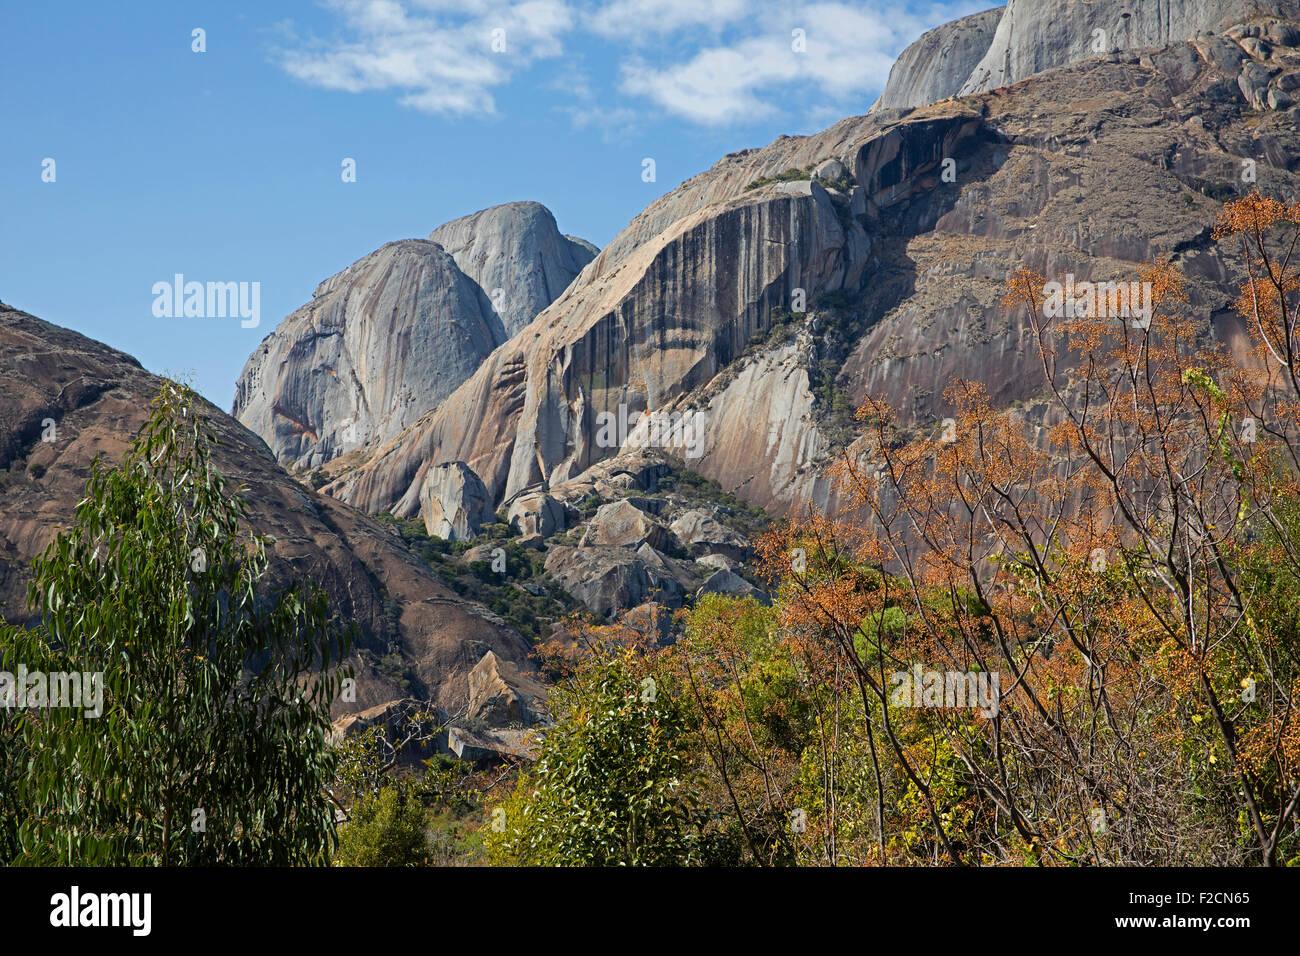 Granite cliffs in the Anja Community Reserve near Ambalavao, Haute Matsiatra, Madagascar, Southeast Africa - Stock Image